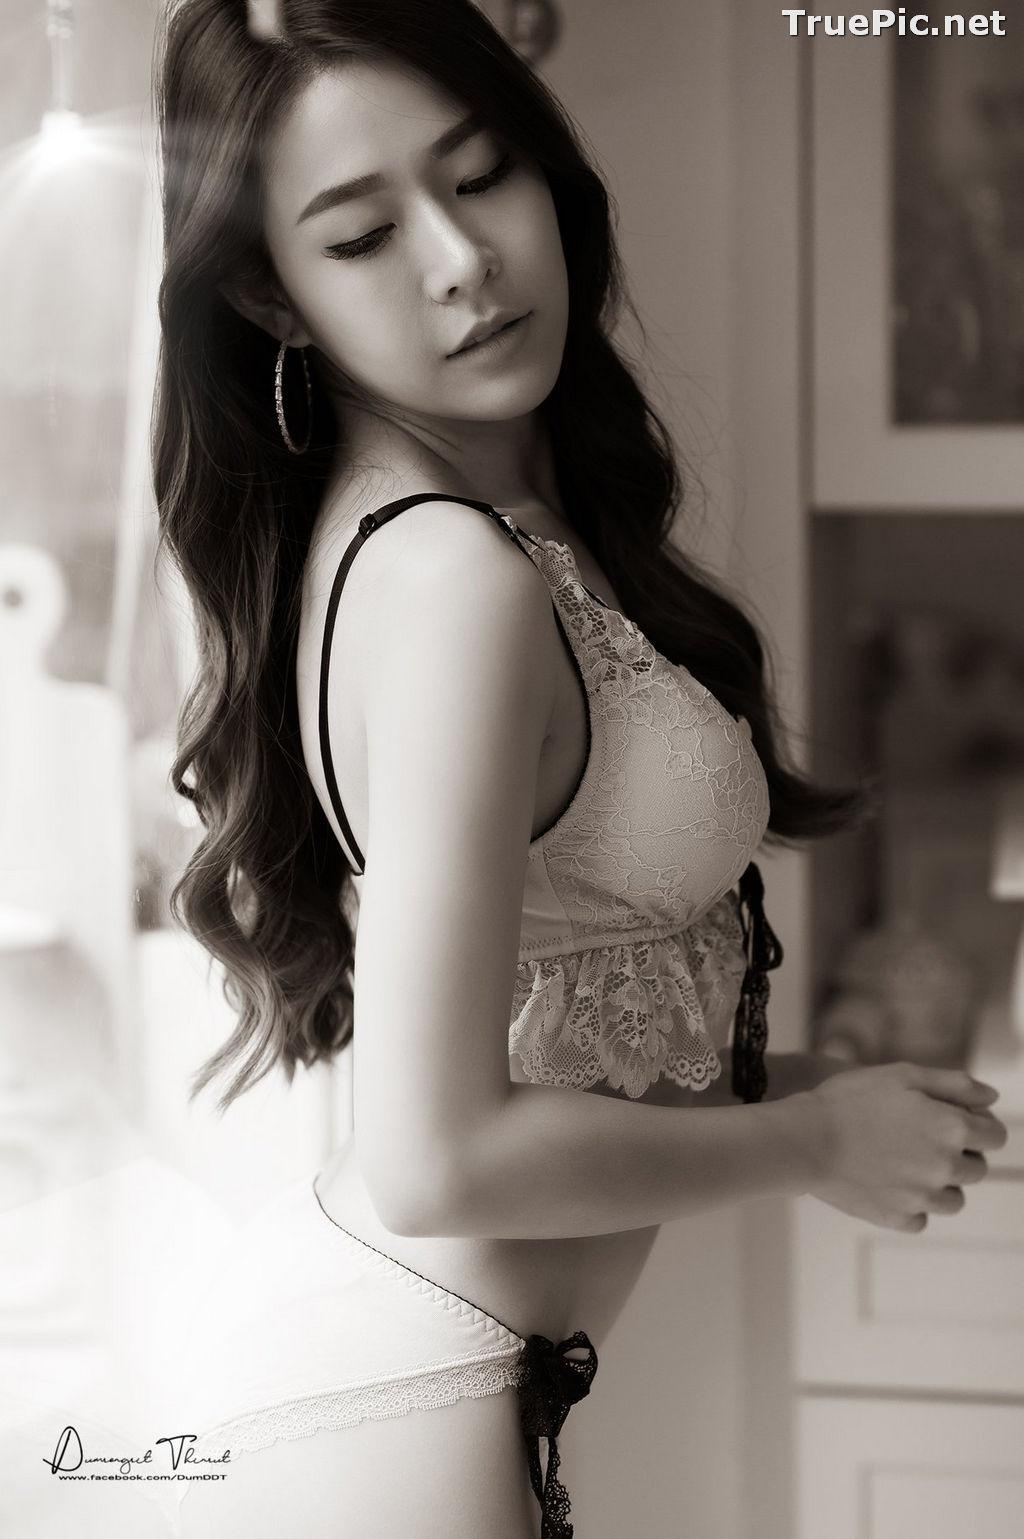 Image Thailand Model - Thipsuda Jitaree - I Am a Beautiful Princess - TruePic.net - Picture-9